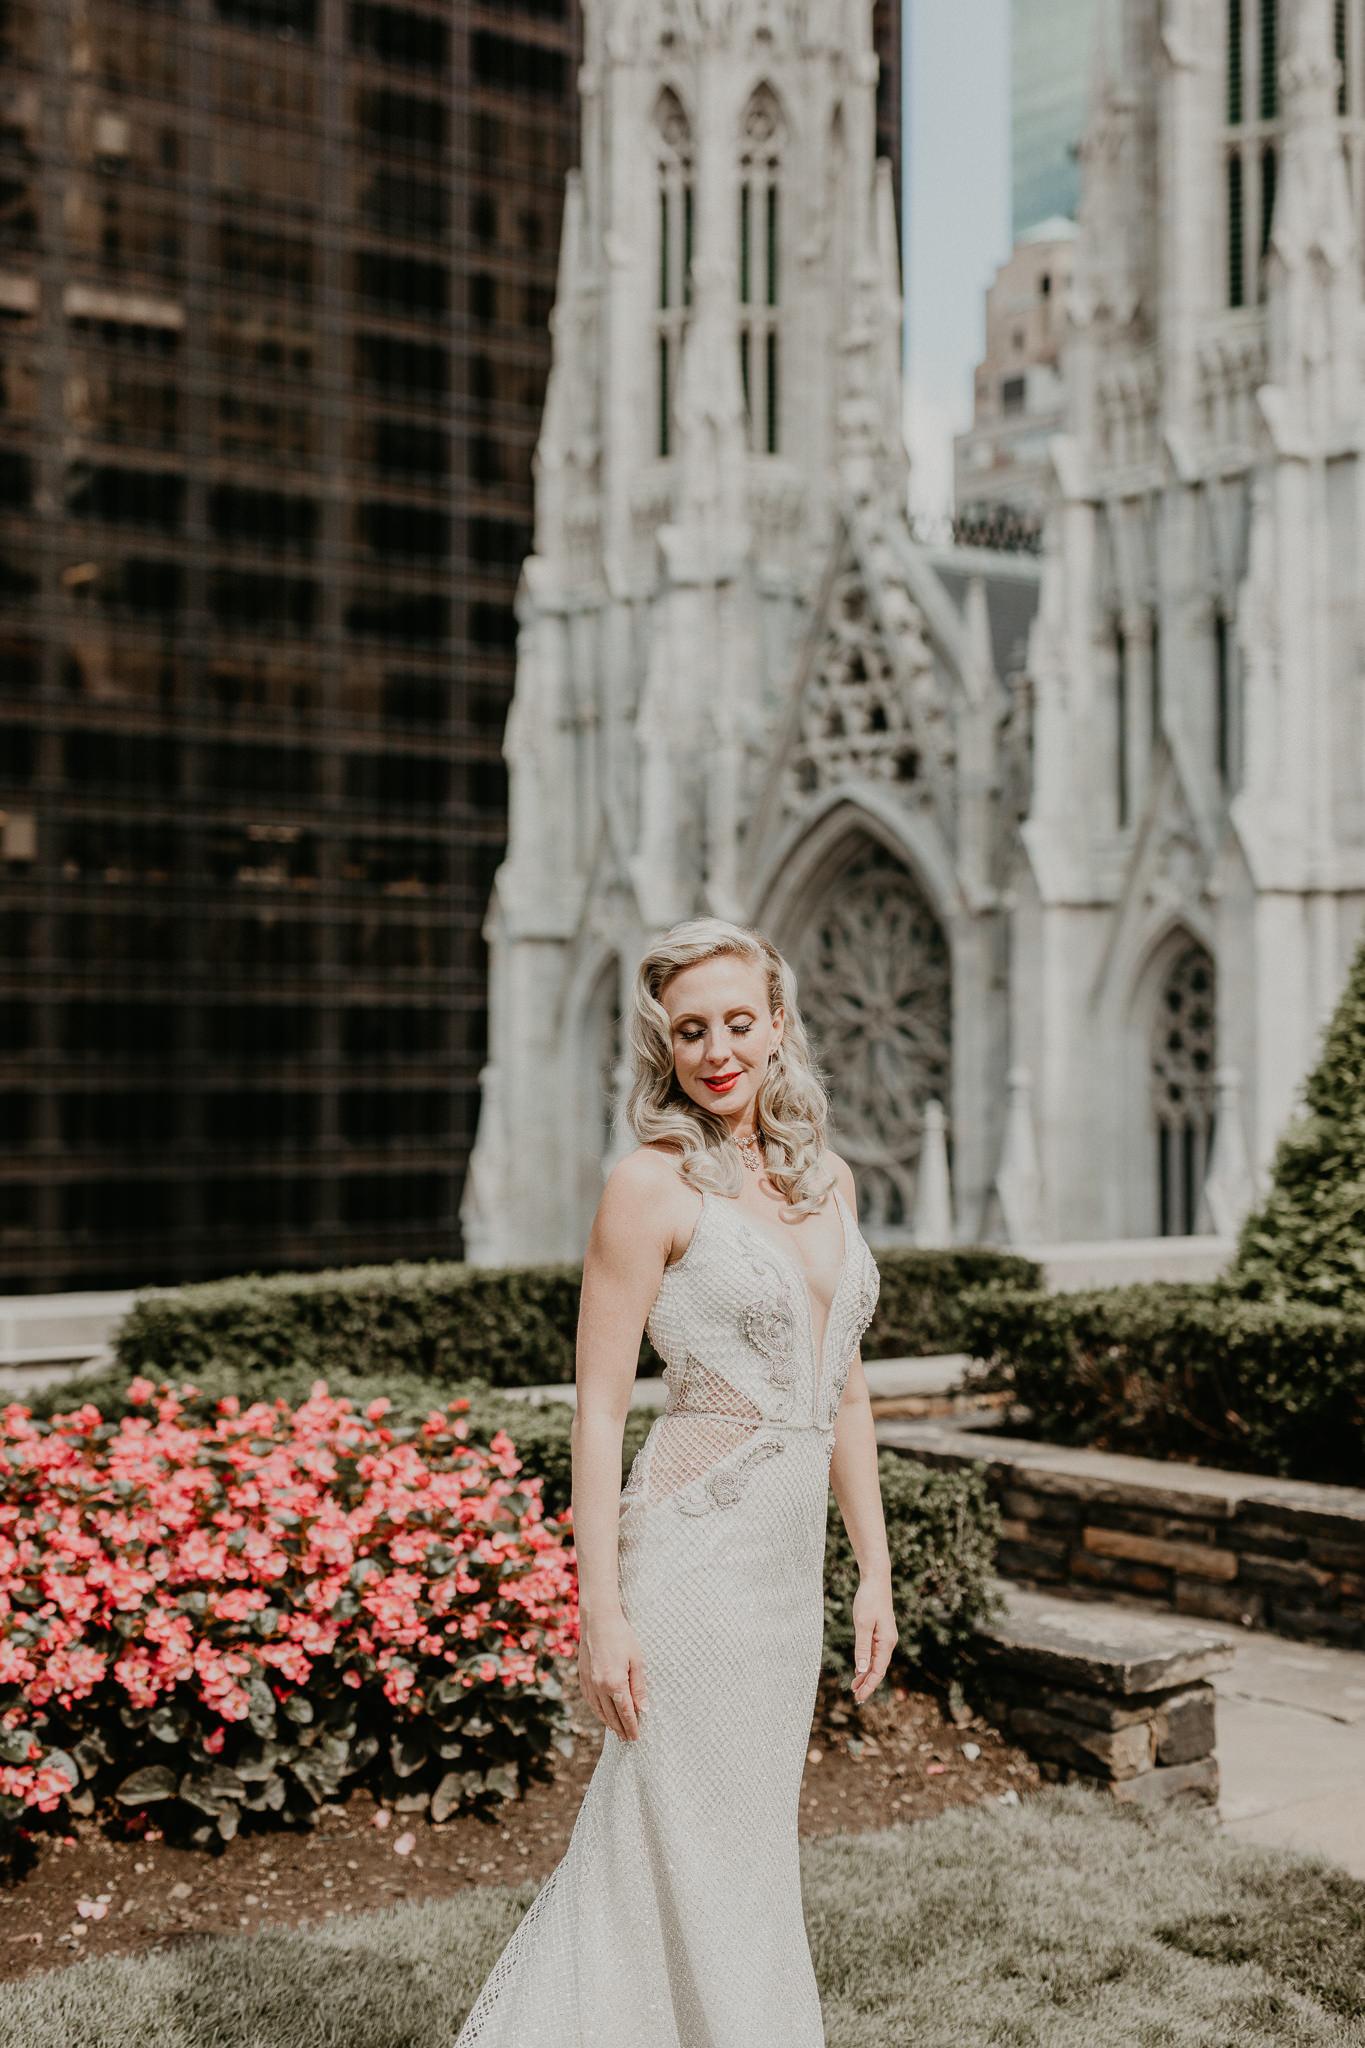 M+J_NYC_Wedding_StPatricks_30Rock_RainbowRoom_045.jpg